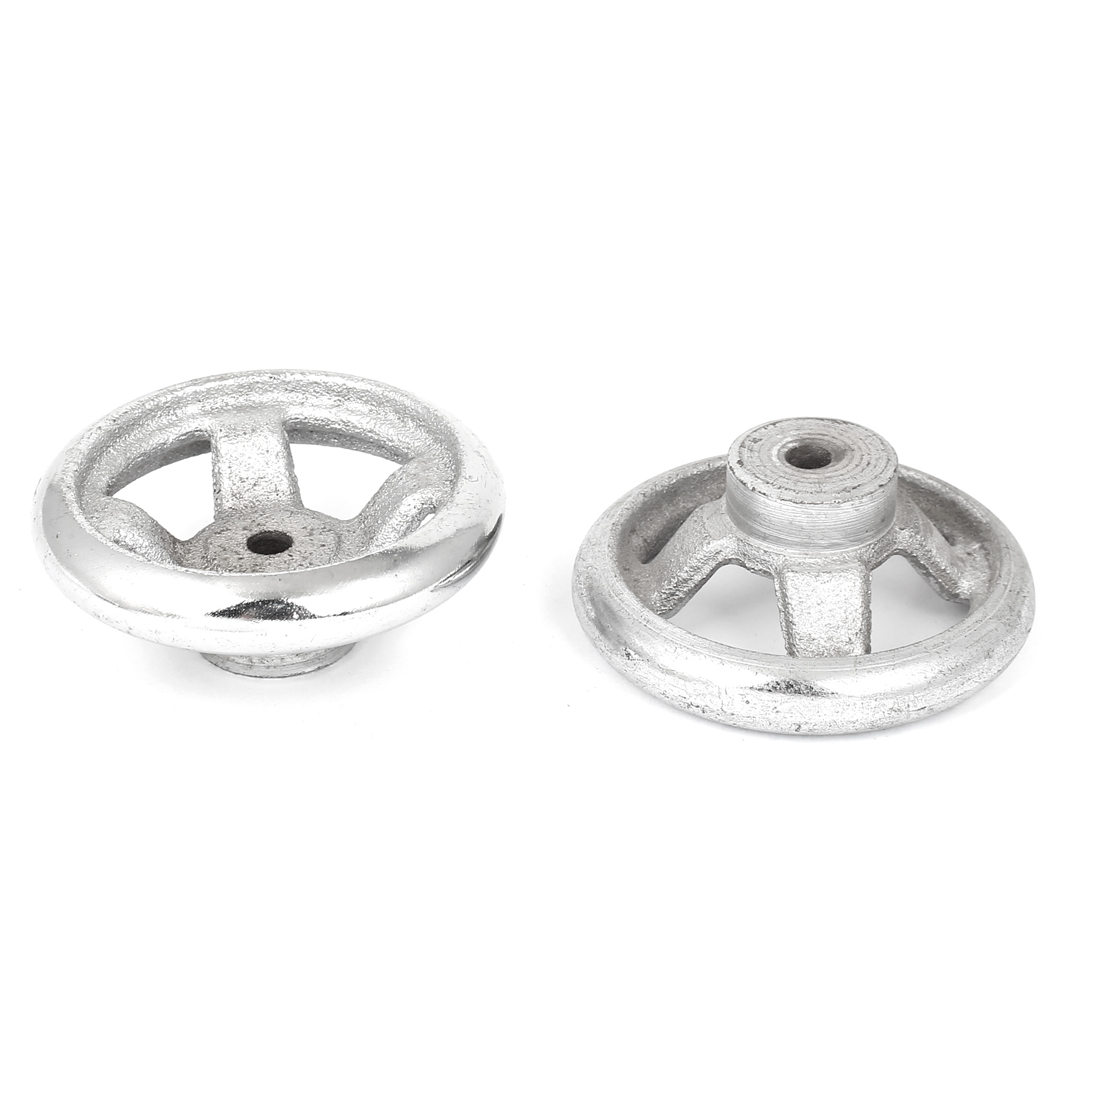 2pcs 70mm Dia Four Spoke Round Iron Hand Wheel Handwheel for Milling Machine Lathe